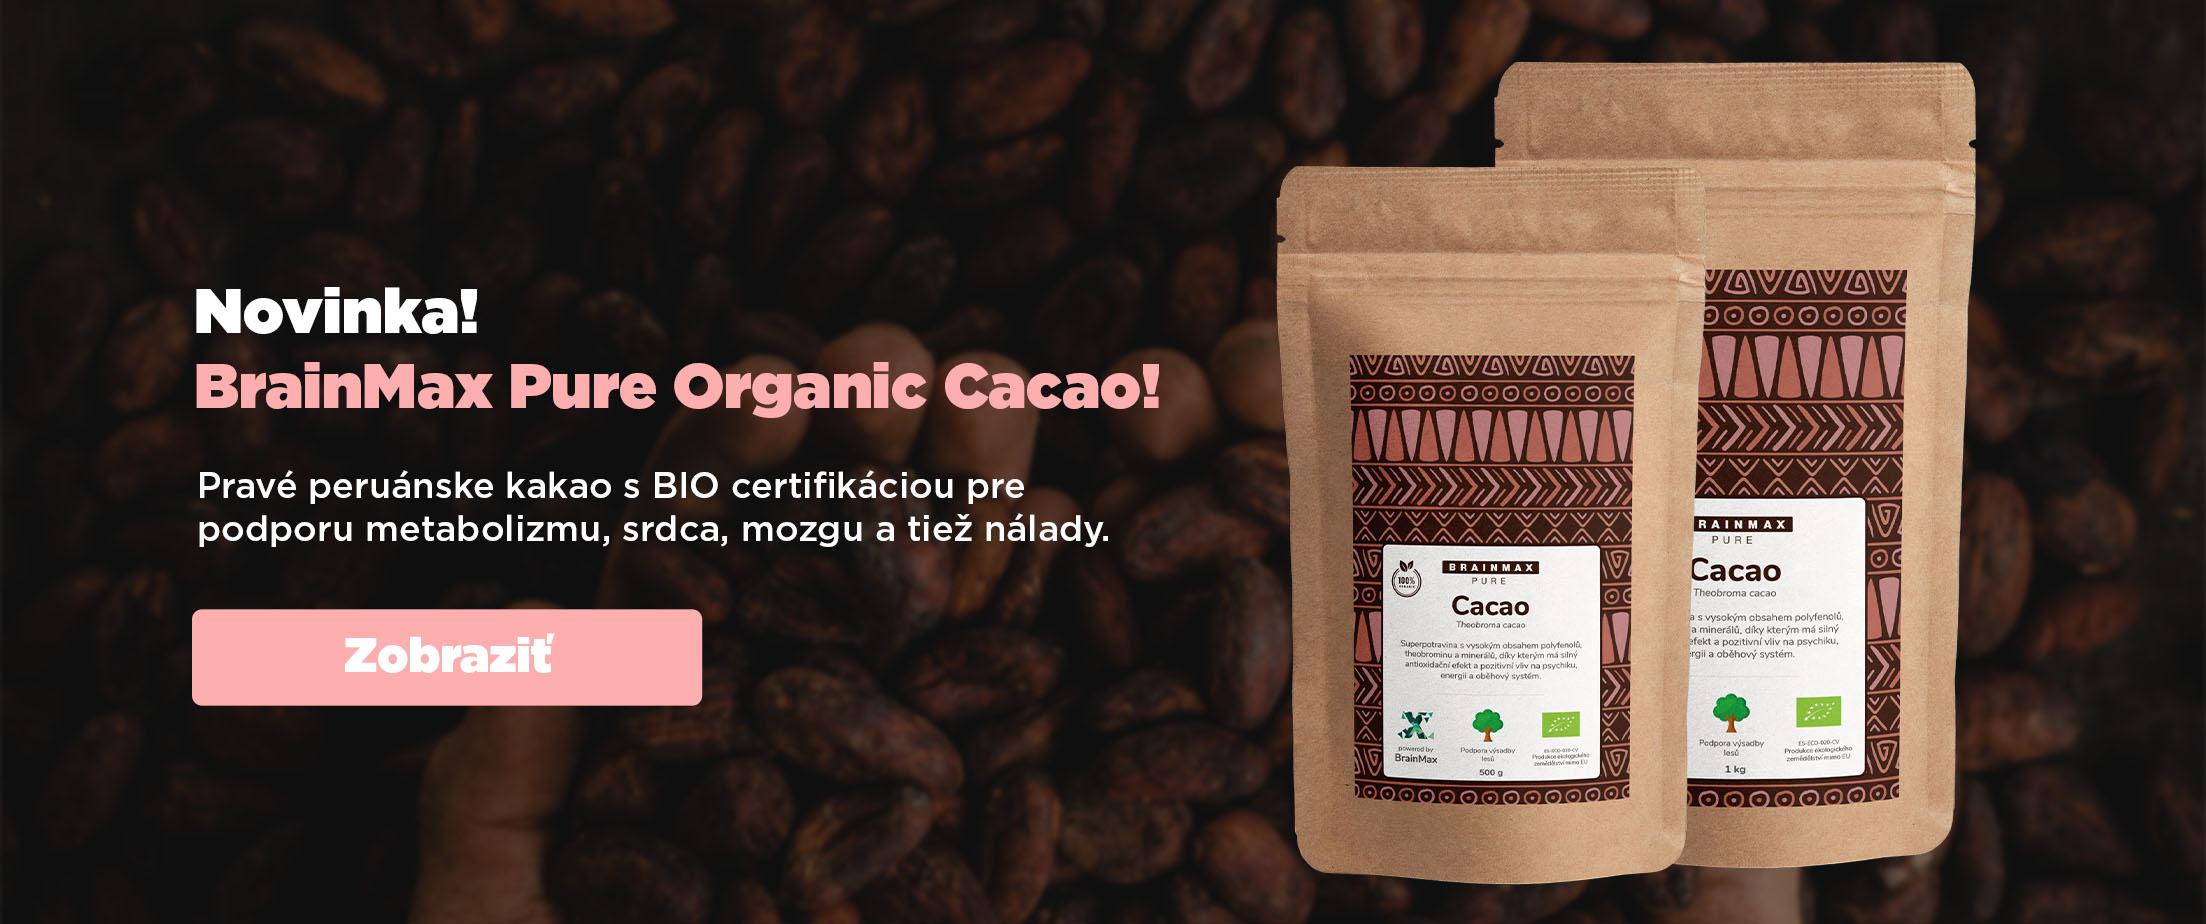 Brainmax Pure Organic Cacao